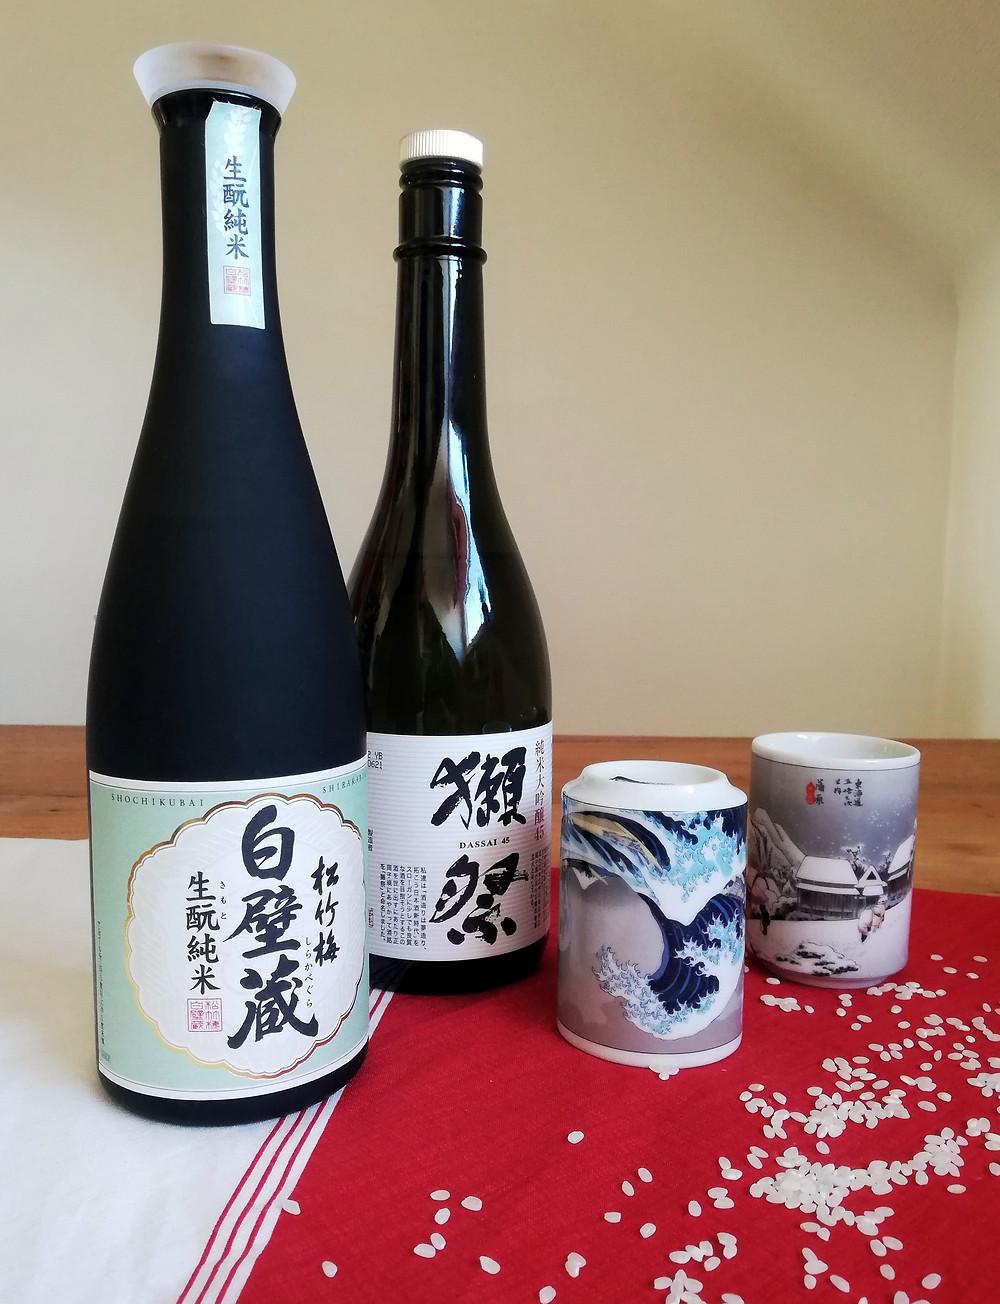 Zusetsu furoshiki bottle wrapping online event sake Japanese rice wine